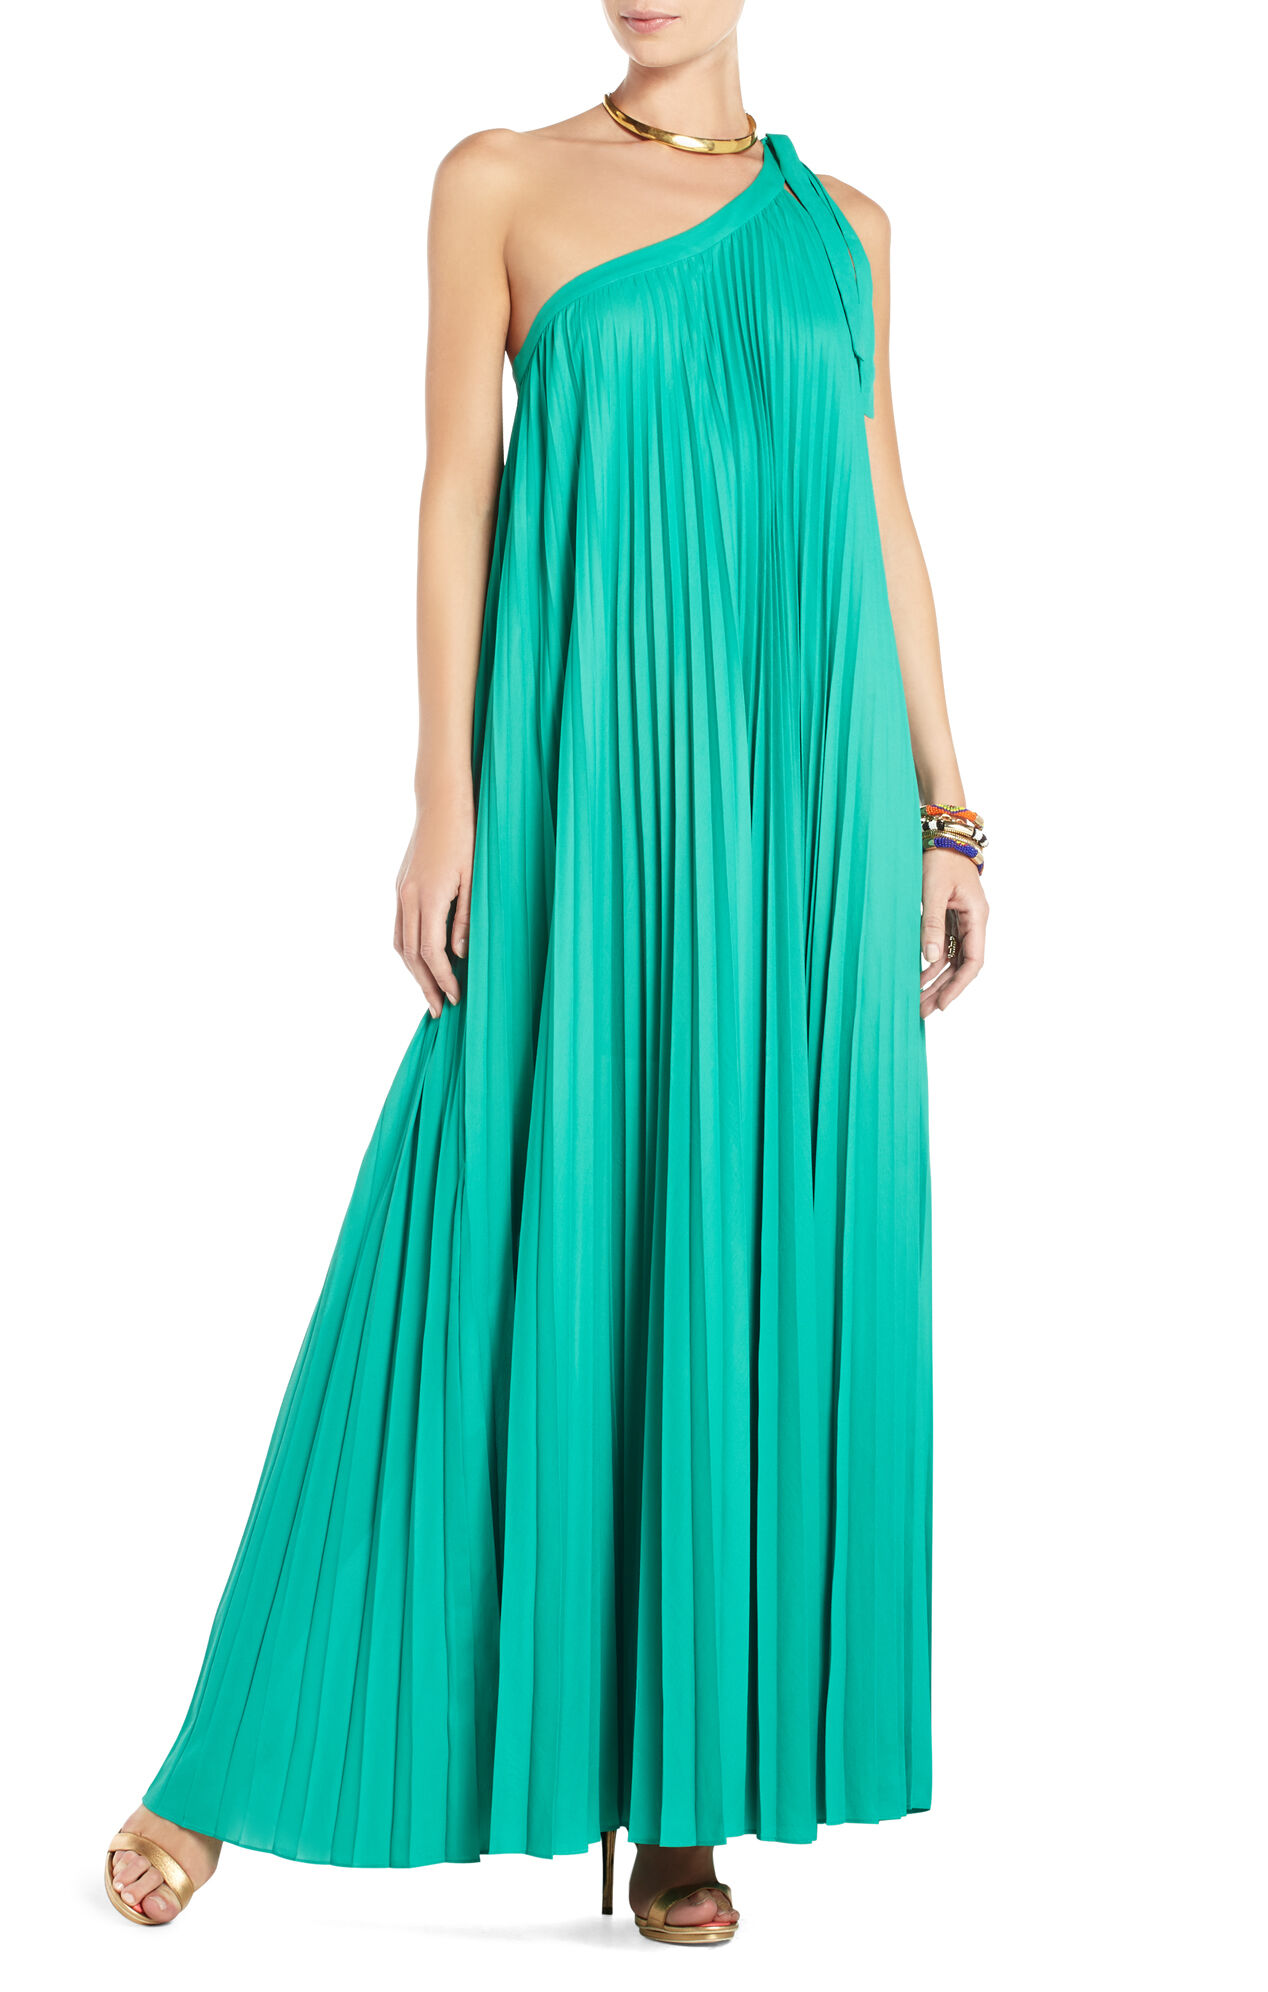 Abee Pleated Maxi Dress